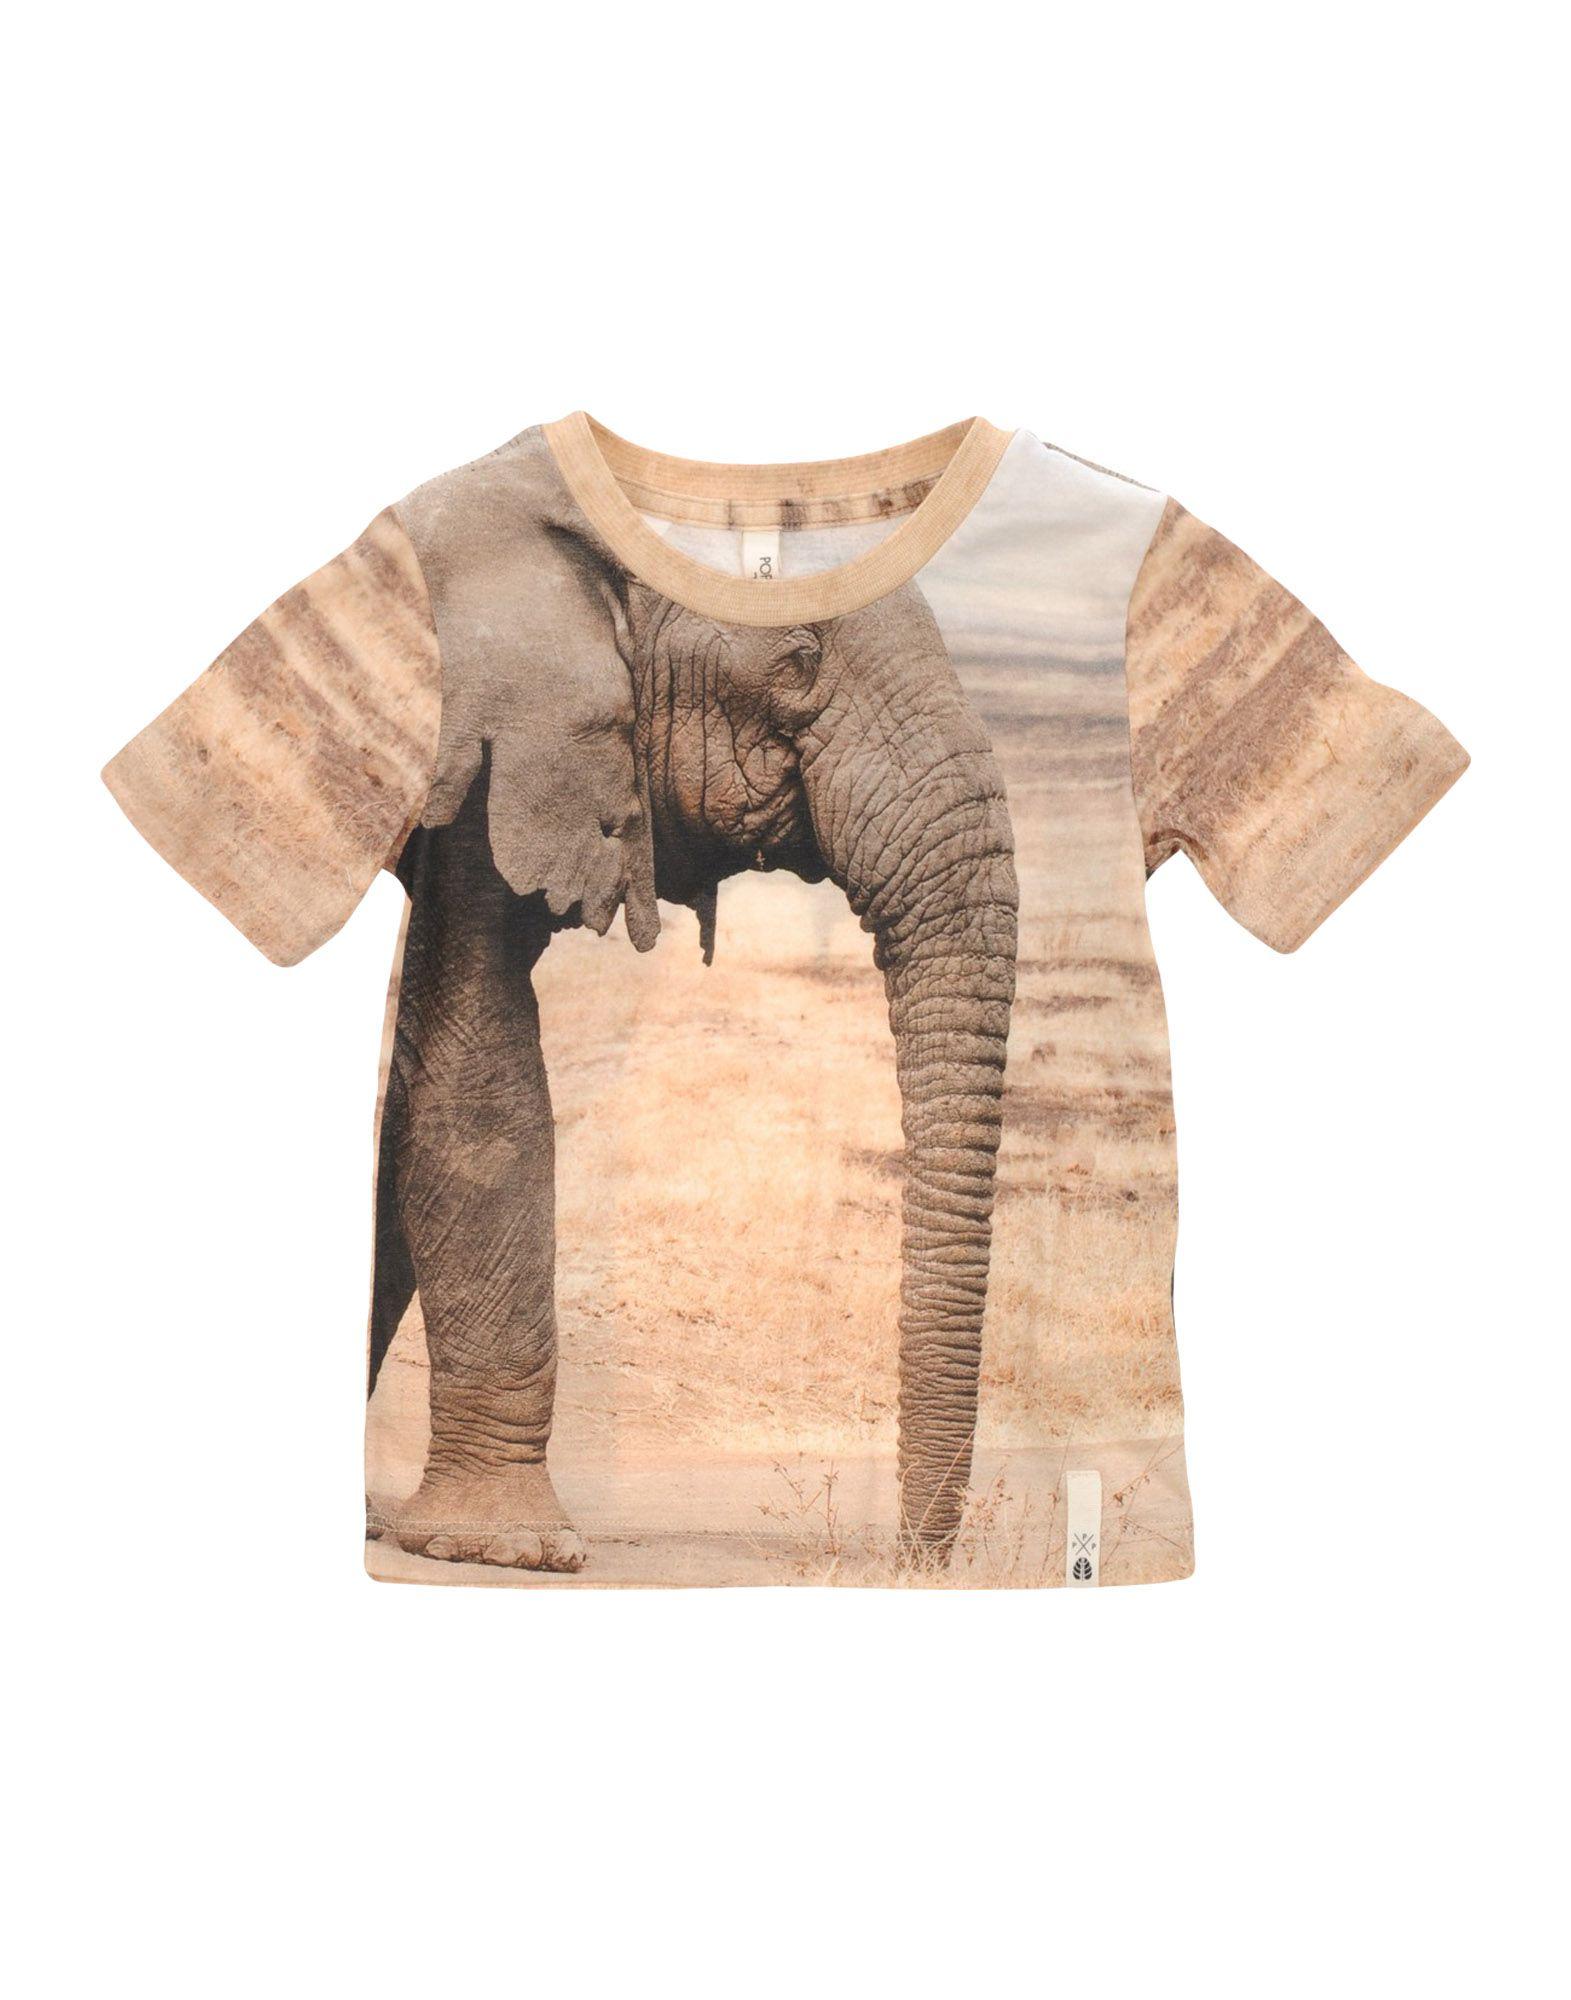 POPUPSHOP Tshirts